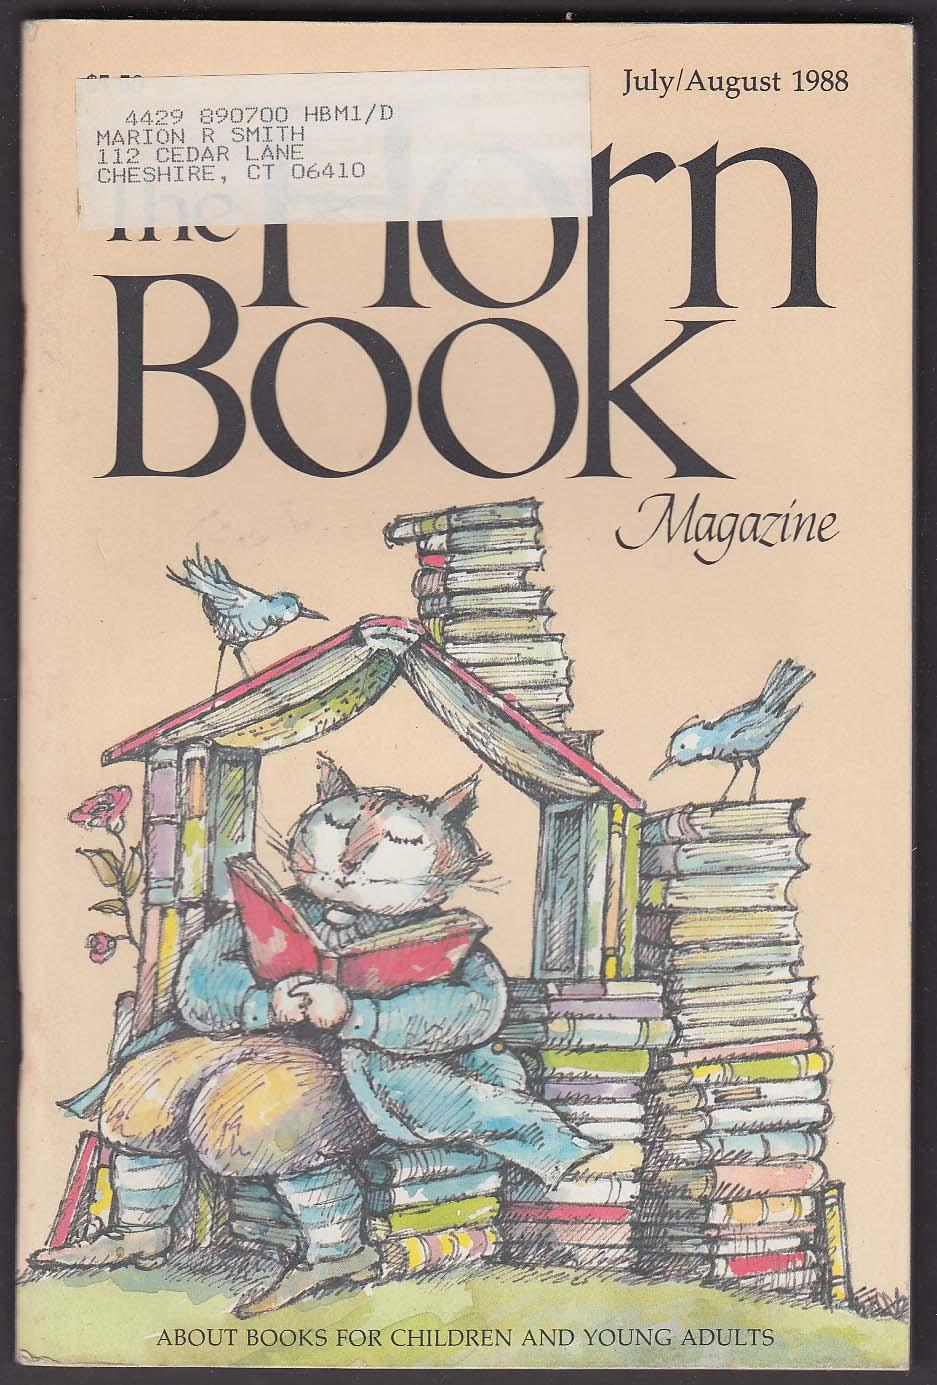 The HORN BOOK Arnold Lobel Lloyd Bloom Russell Freedman John Schoenherr 7-8 1988